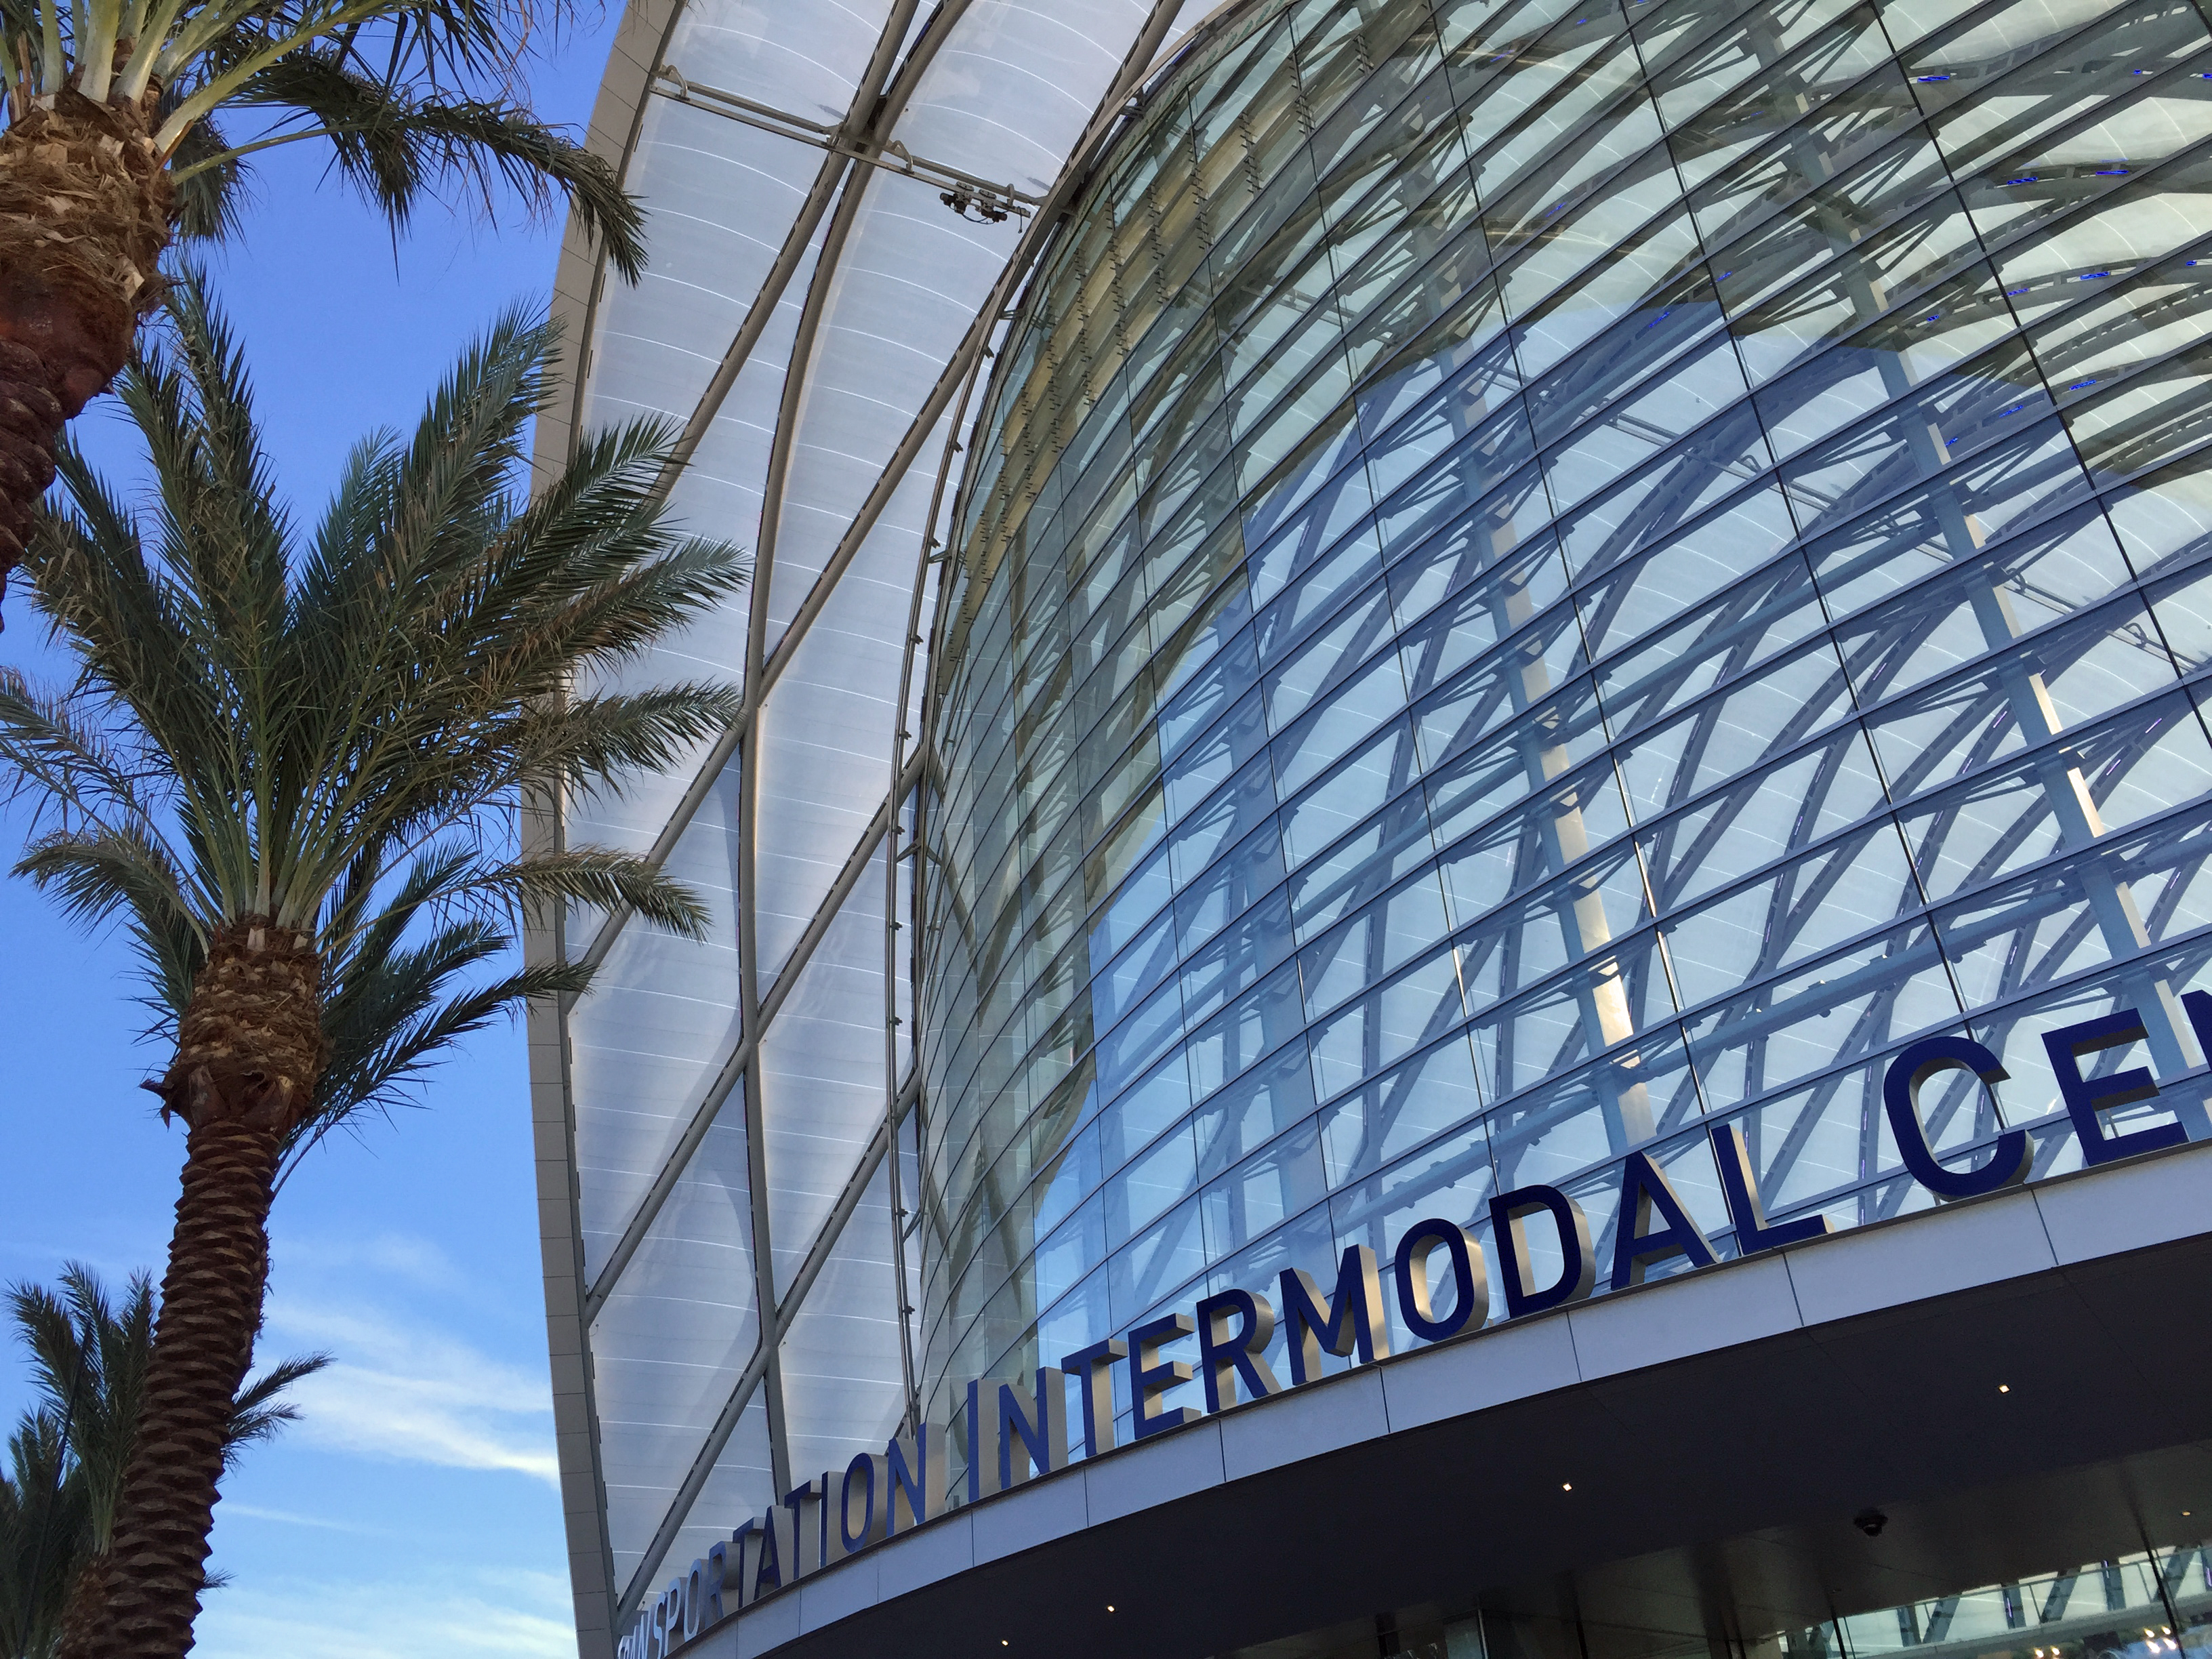 The Anaheim Regional Transportation Intermodal Center officially opened on December 8.